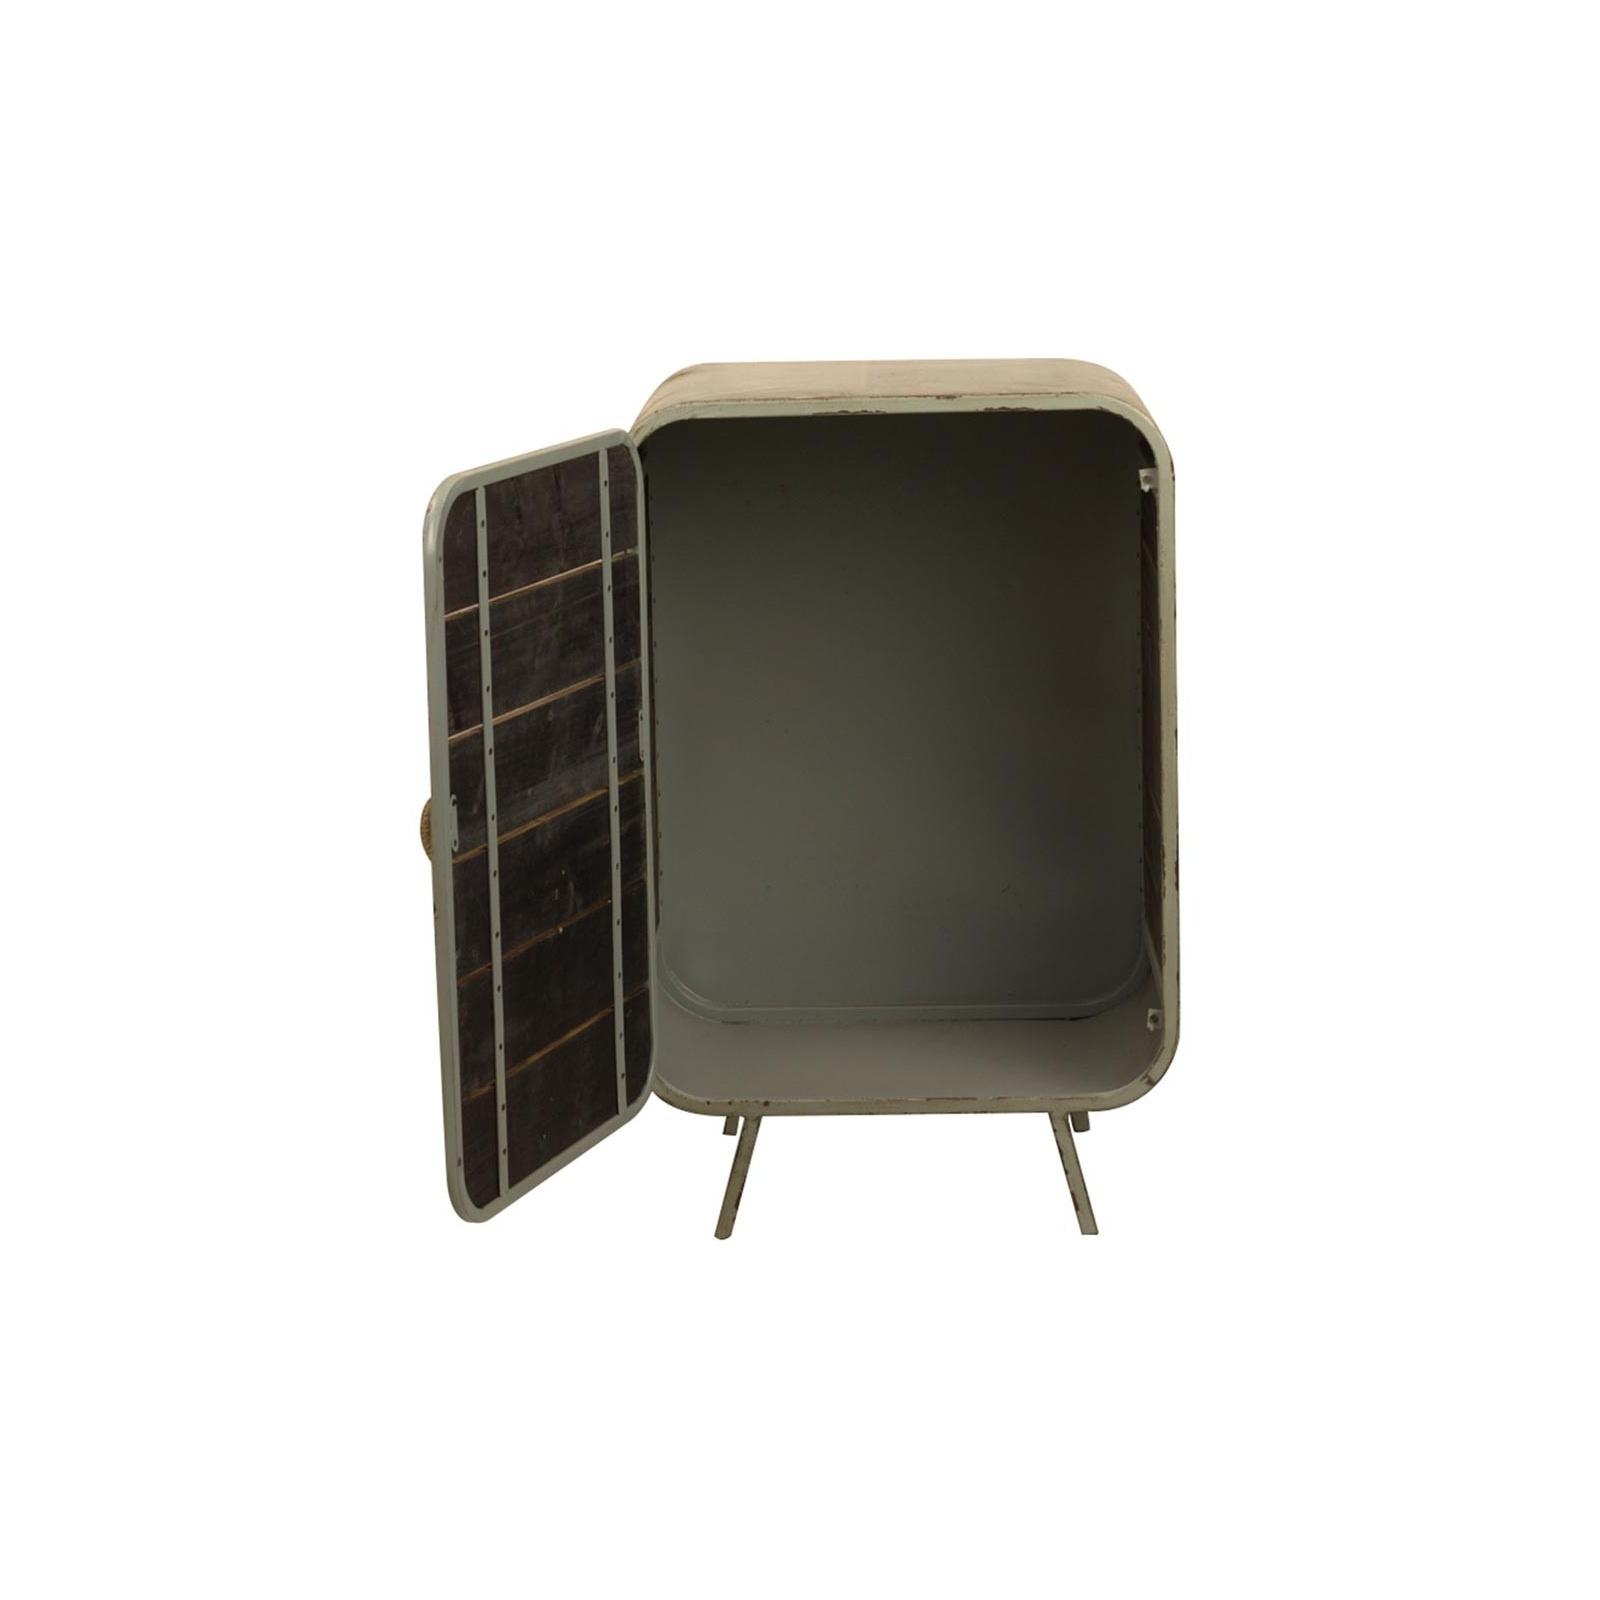 bout de canap jp2b d coration. Black Bedroom Furniture Sets. Home Design Ideas